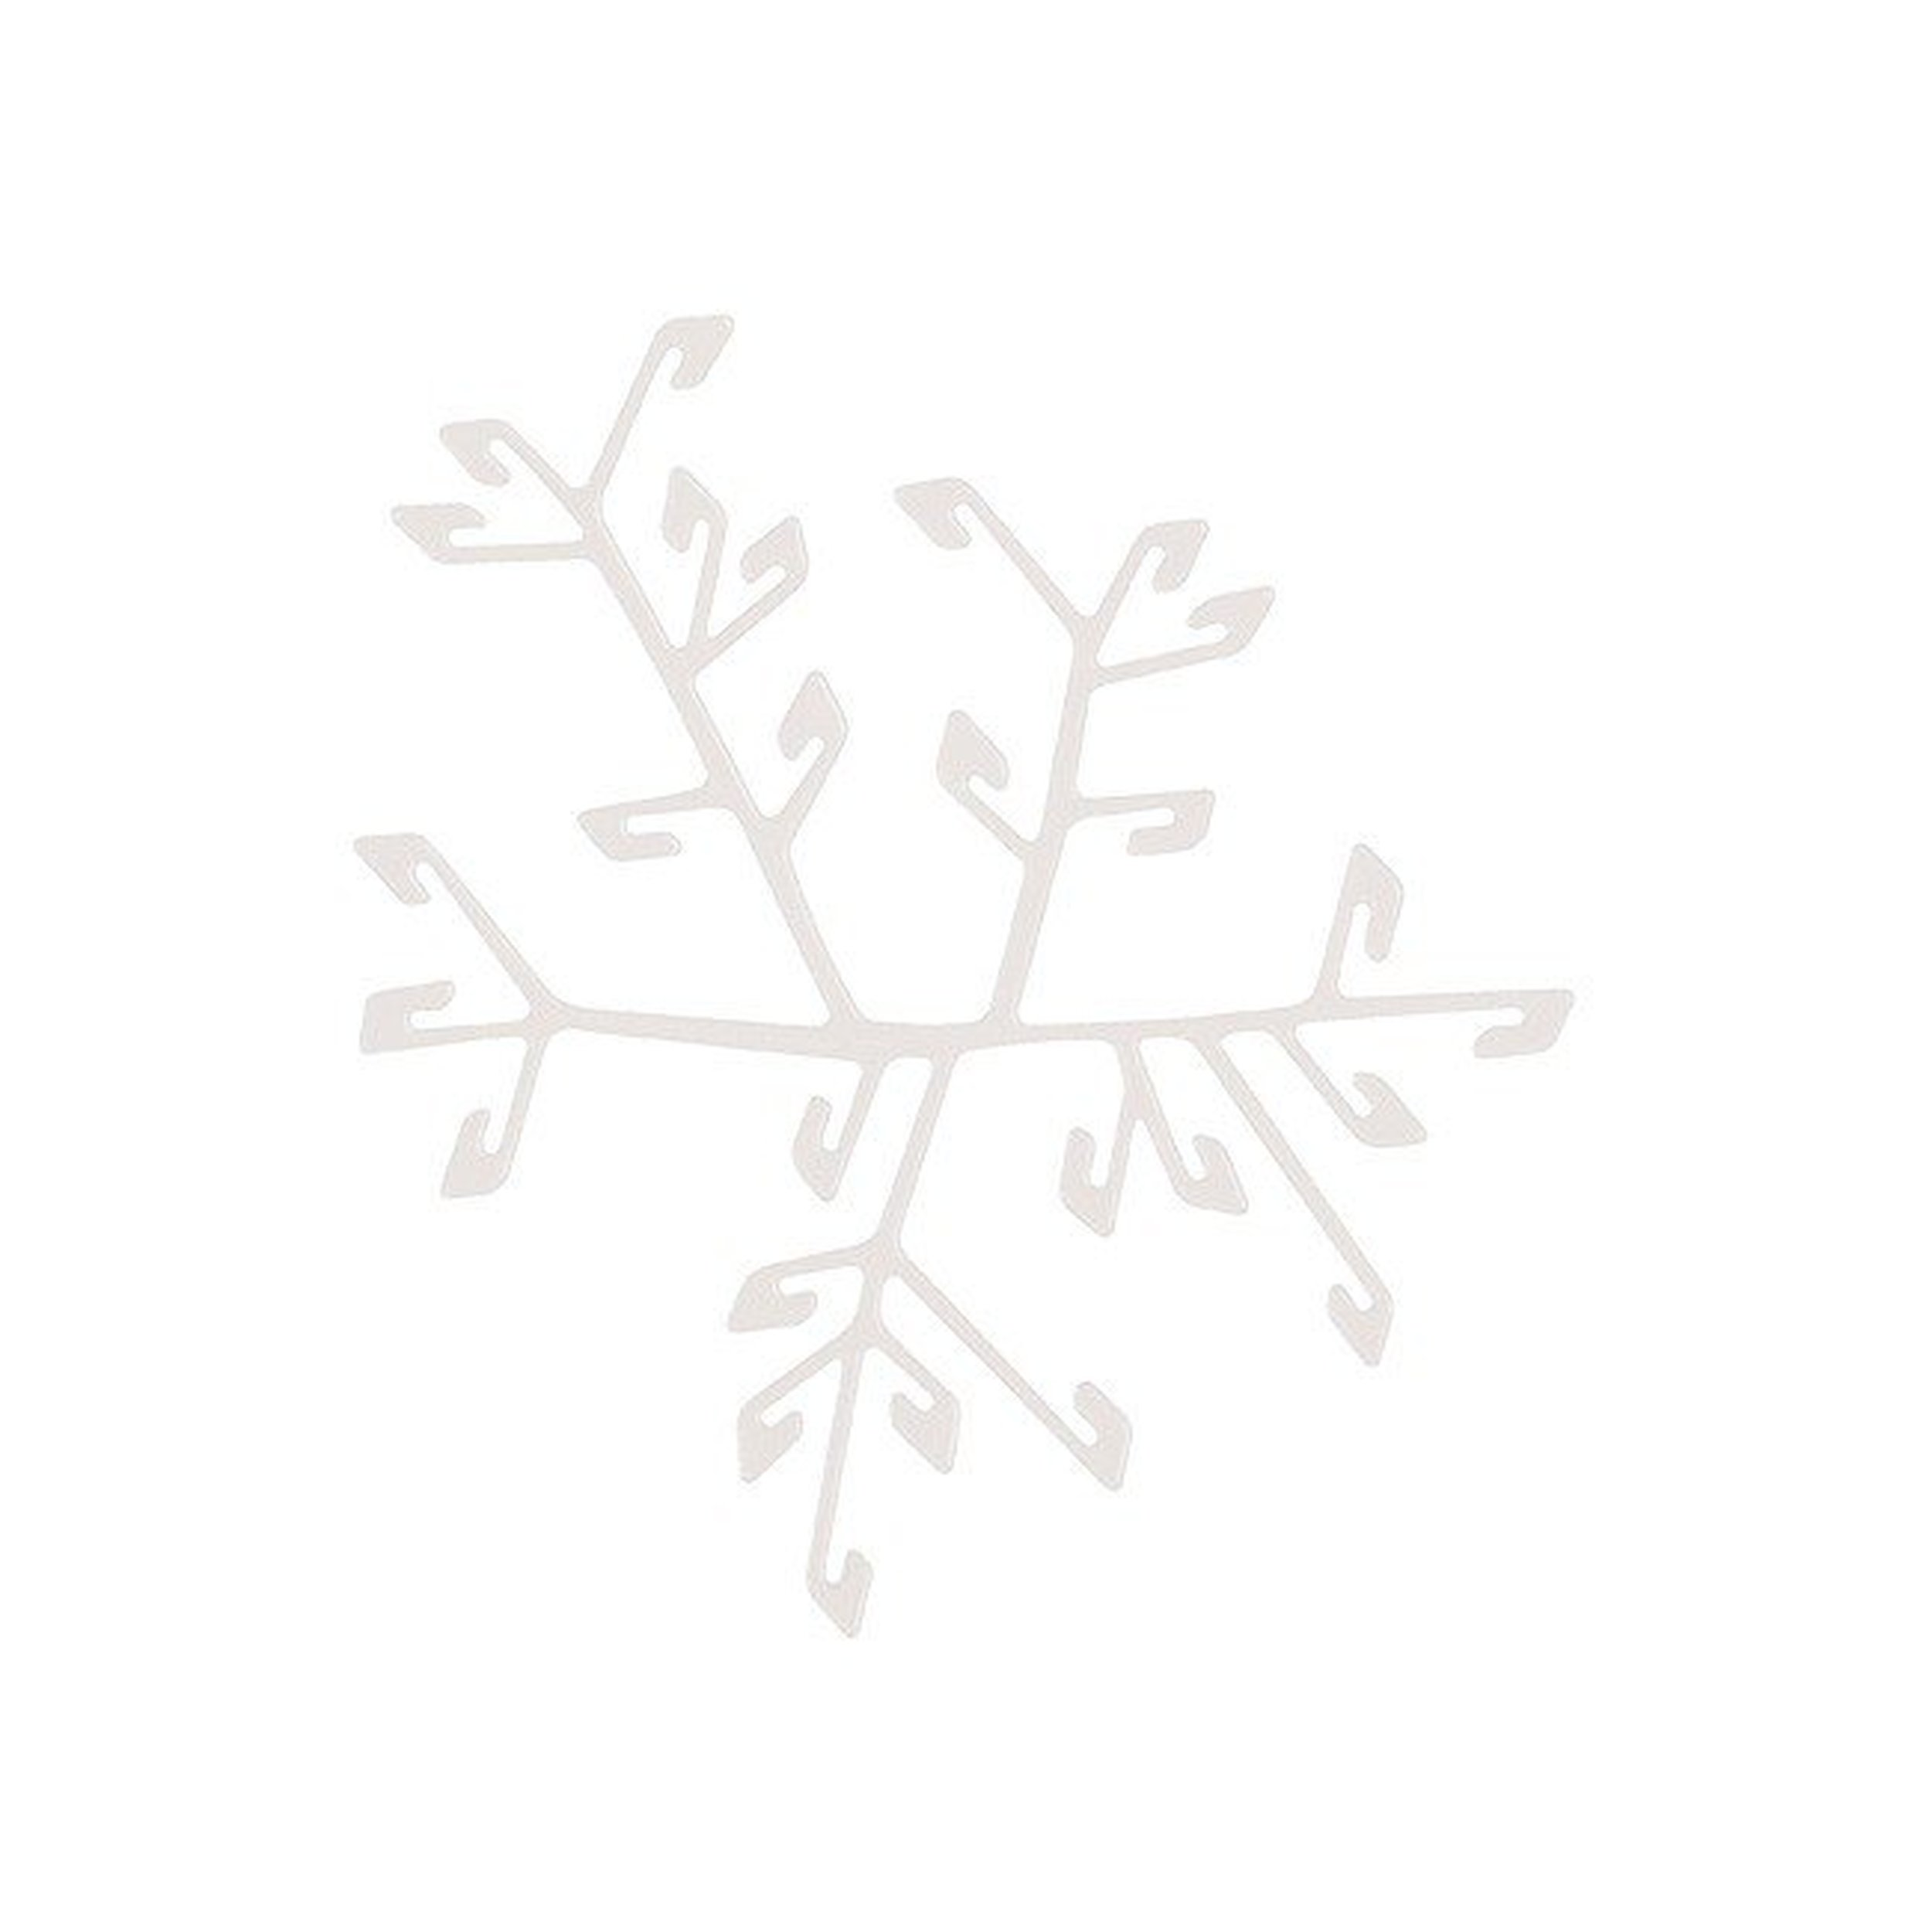 Dekoracja Cherrie biała